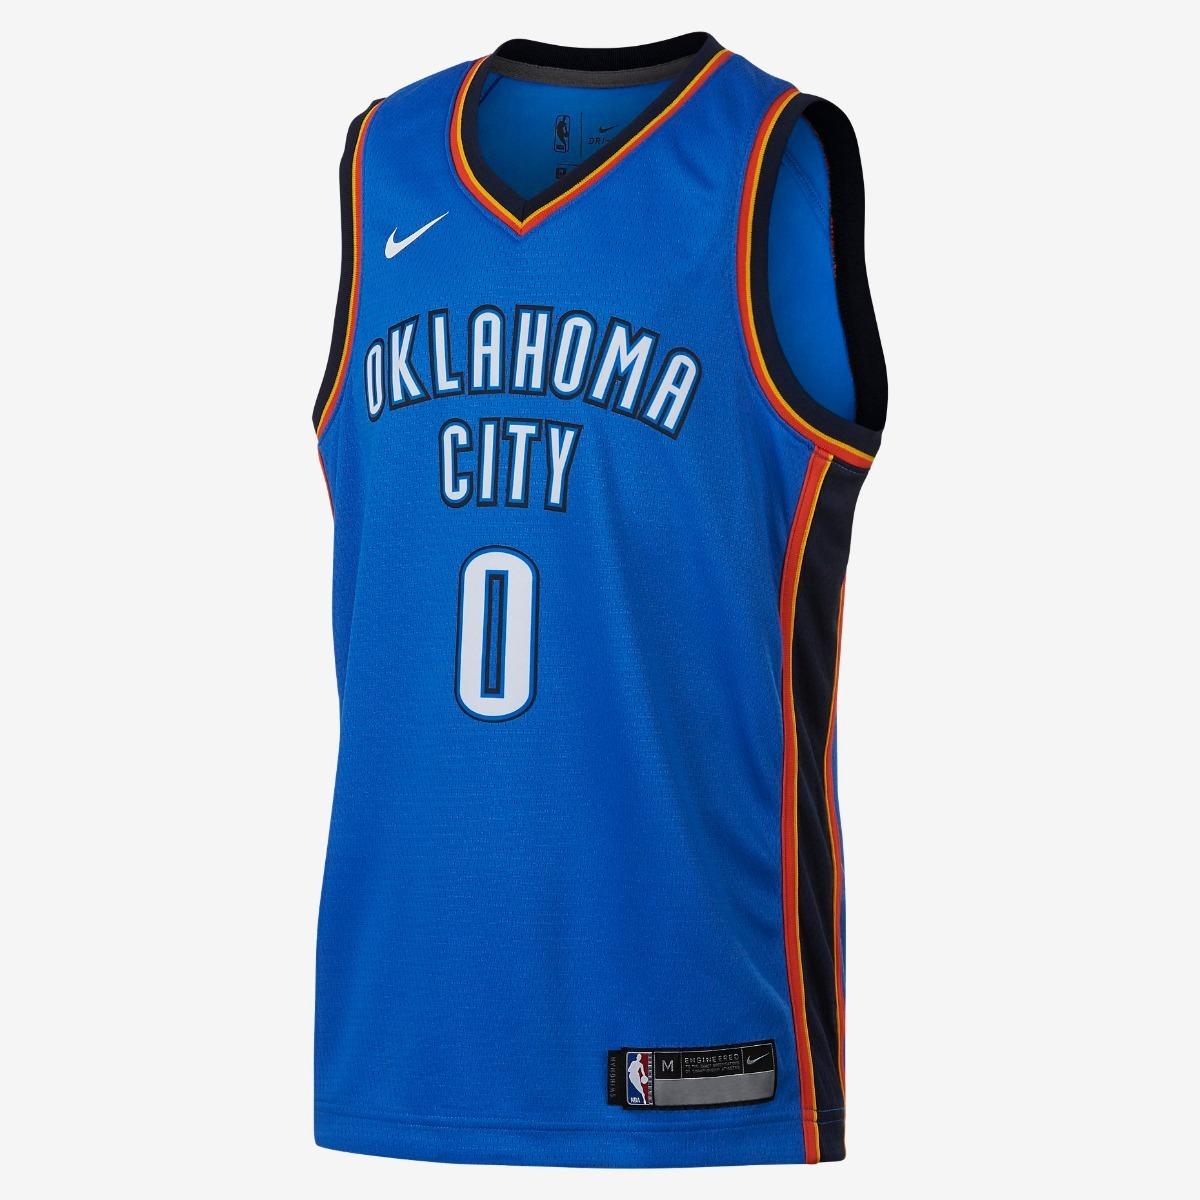 fa005d178d98c camiseta nike nba oklahoma city thunder - 0 westbrook. Cargando zoom.